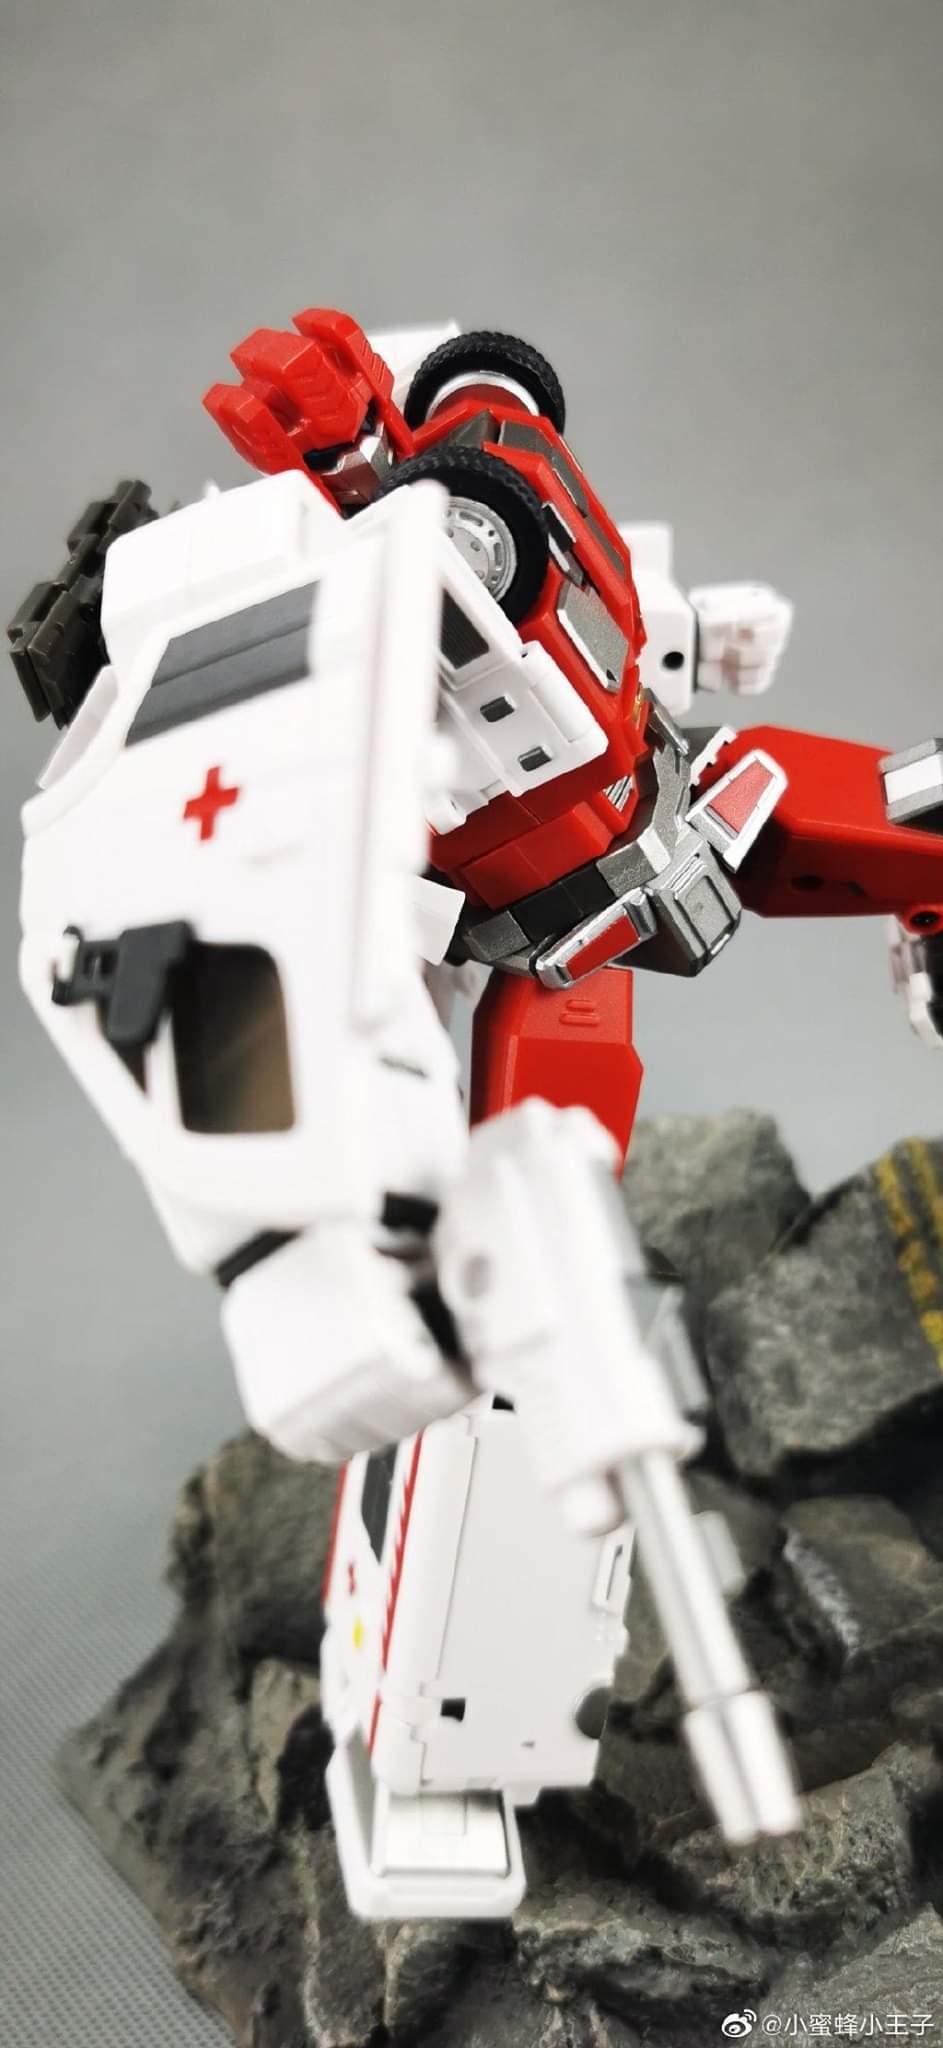 [Generation Toy] Produit Tiers - Jouet GT-08 Guardian - aka Defensor/Defenso - Page 2 L523ypZa_o